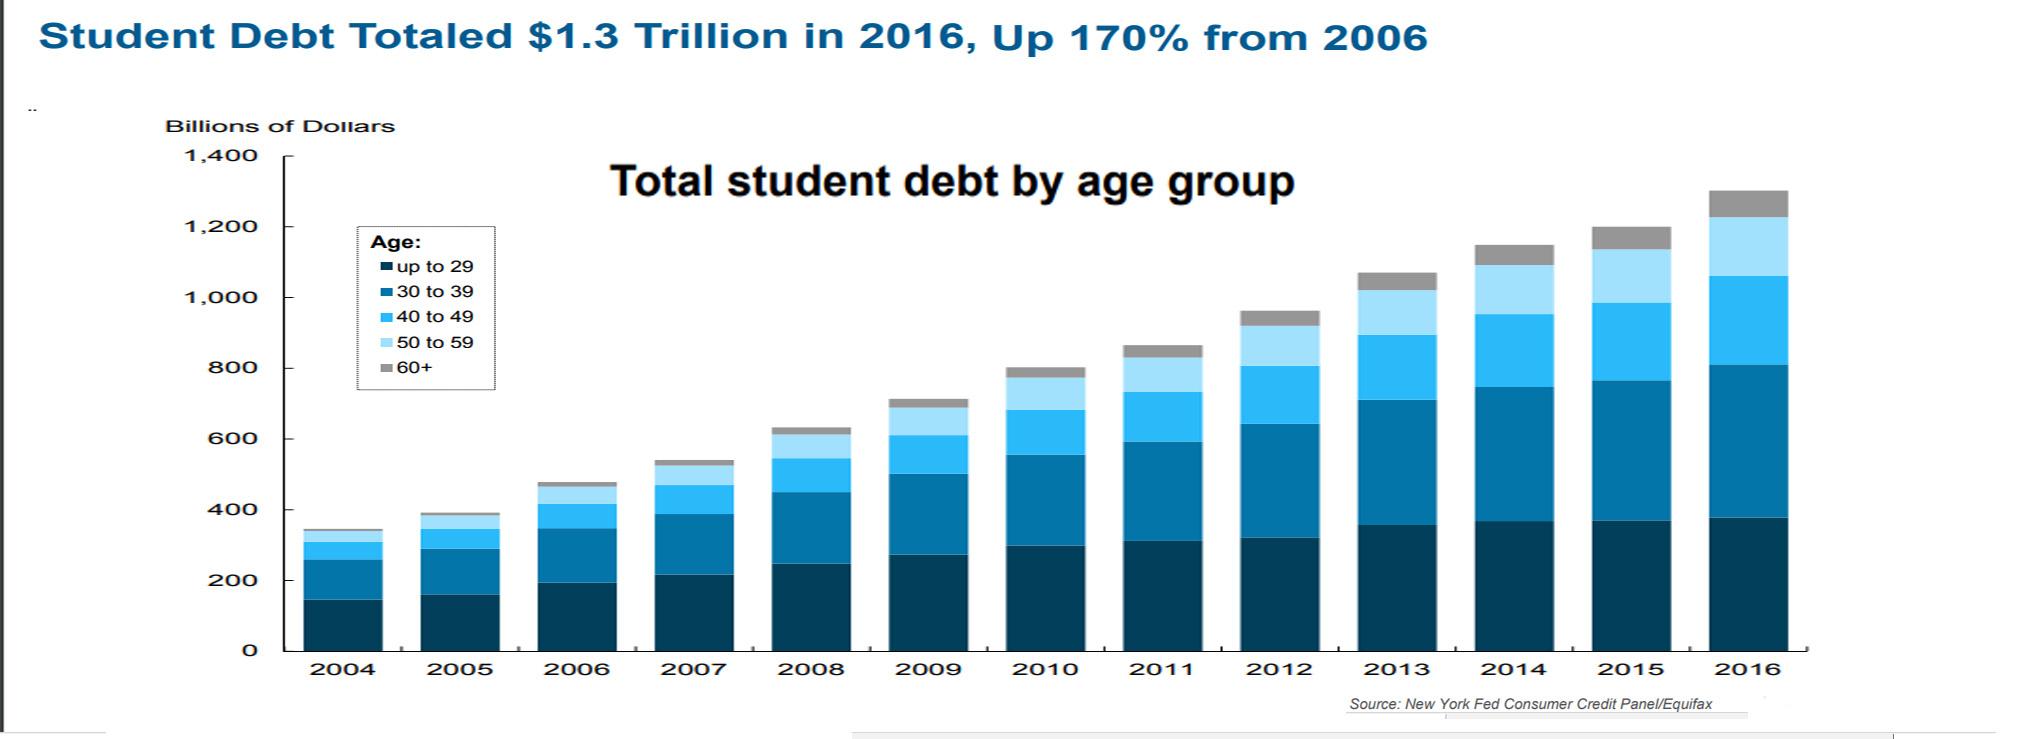 Seeking a debt-free college education